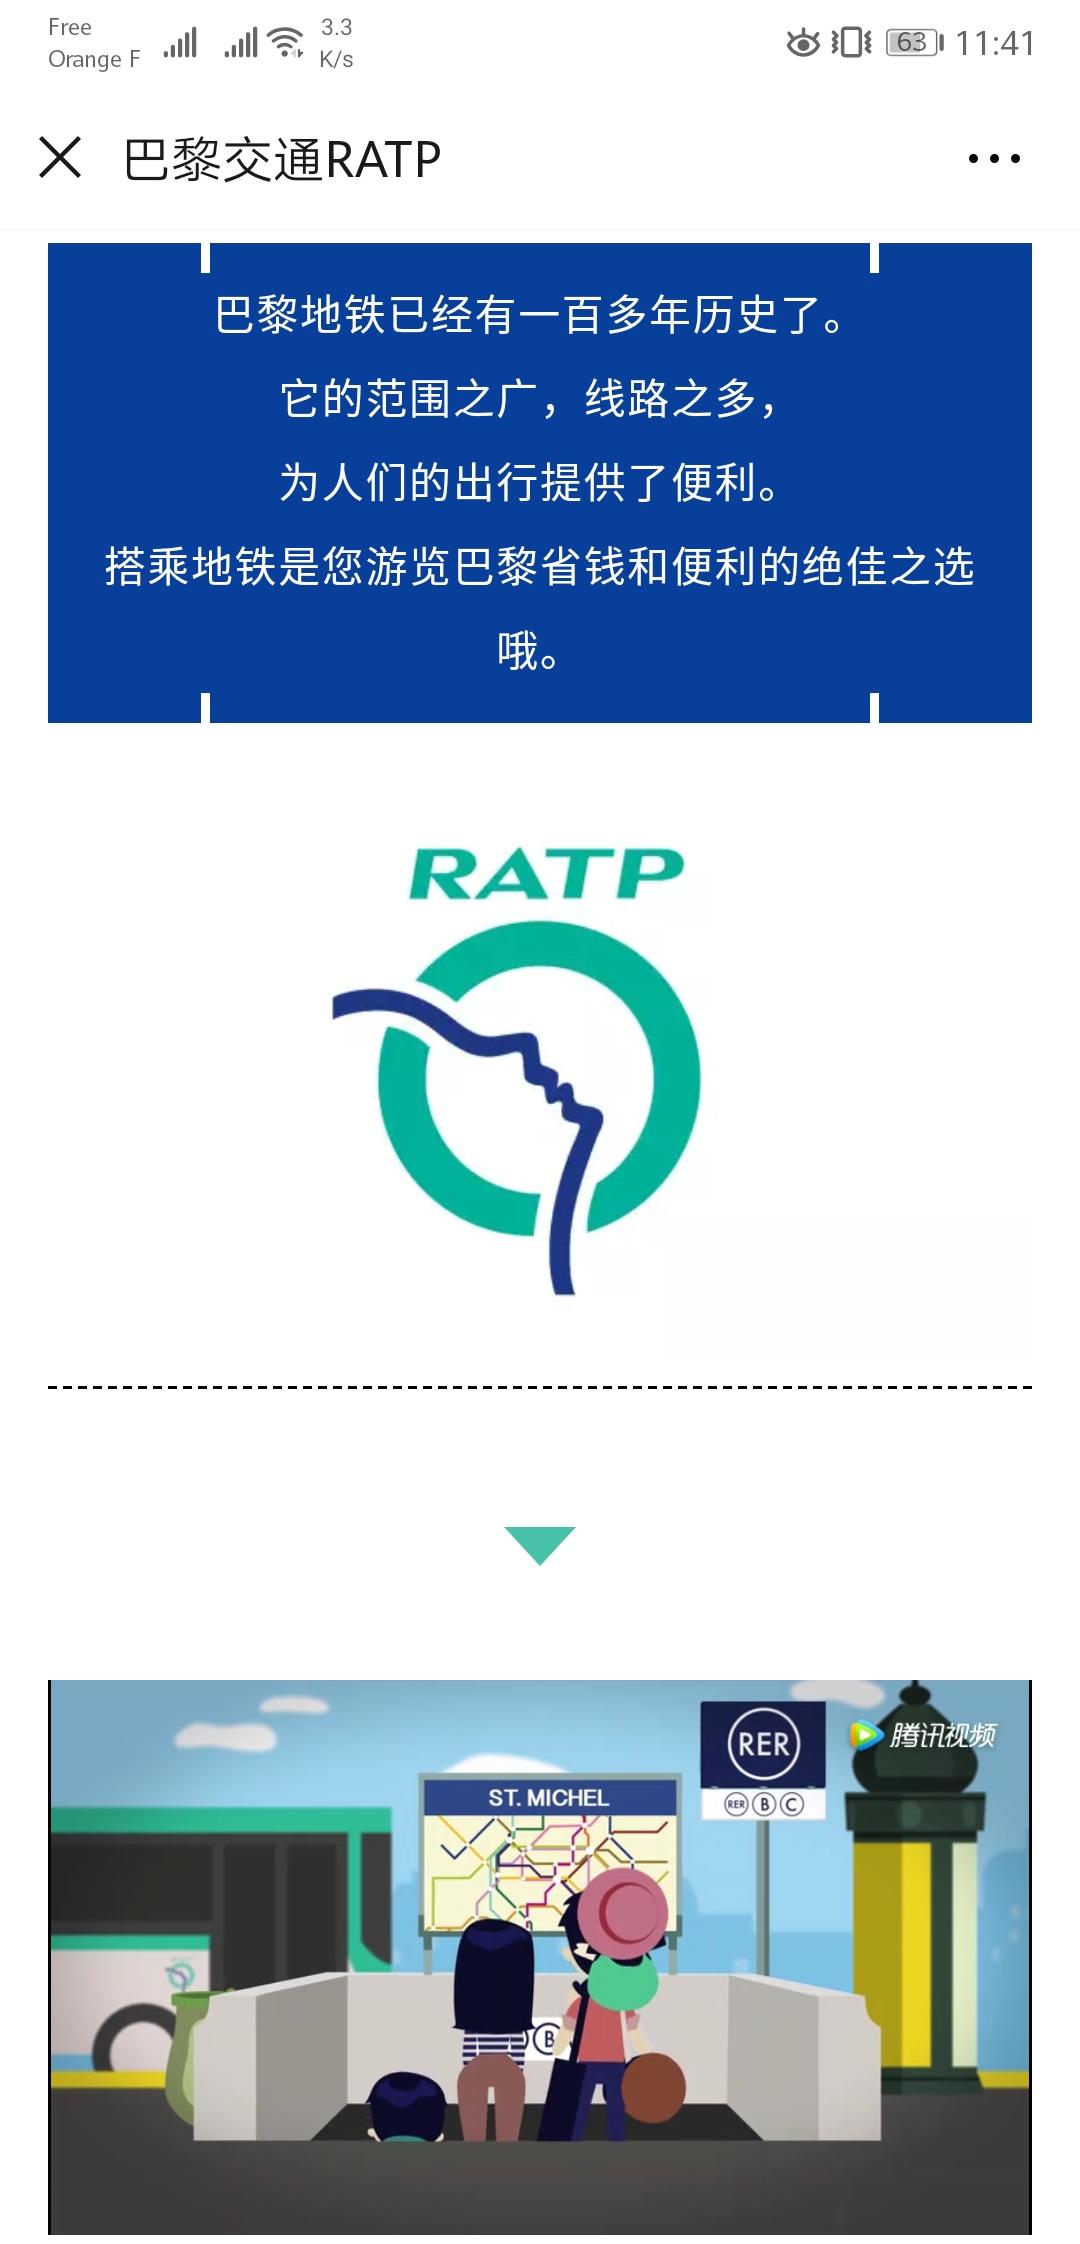 RATP WeChat account